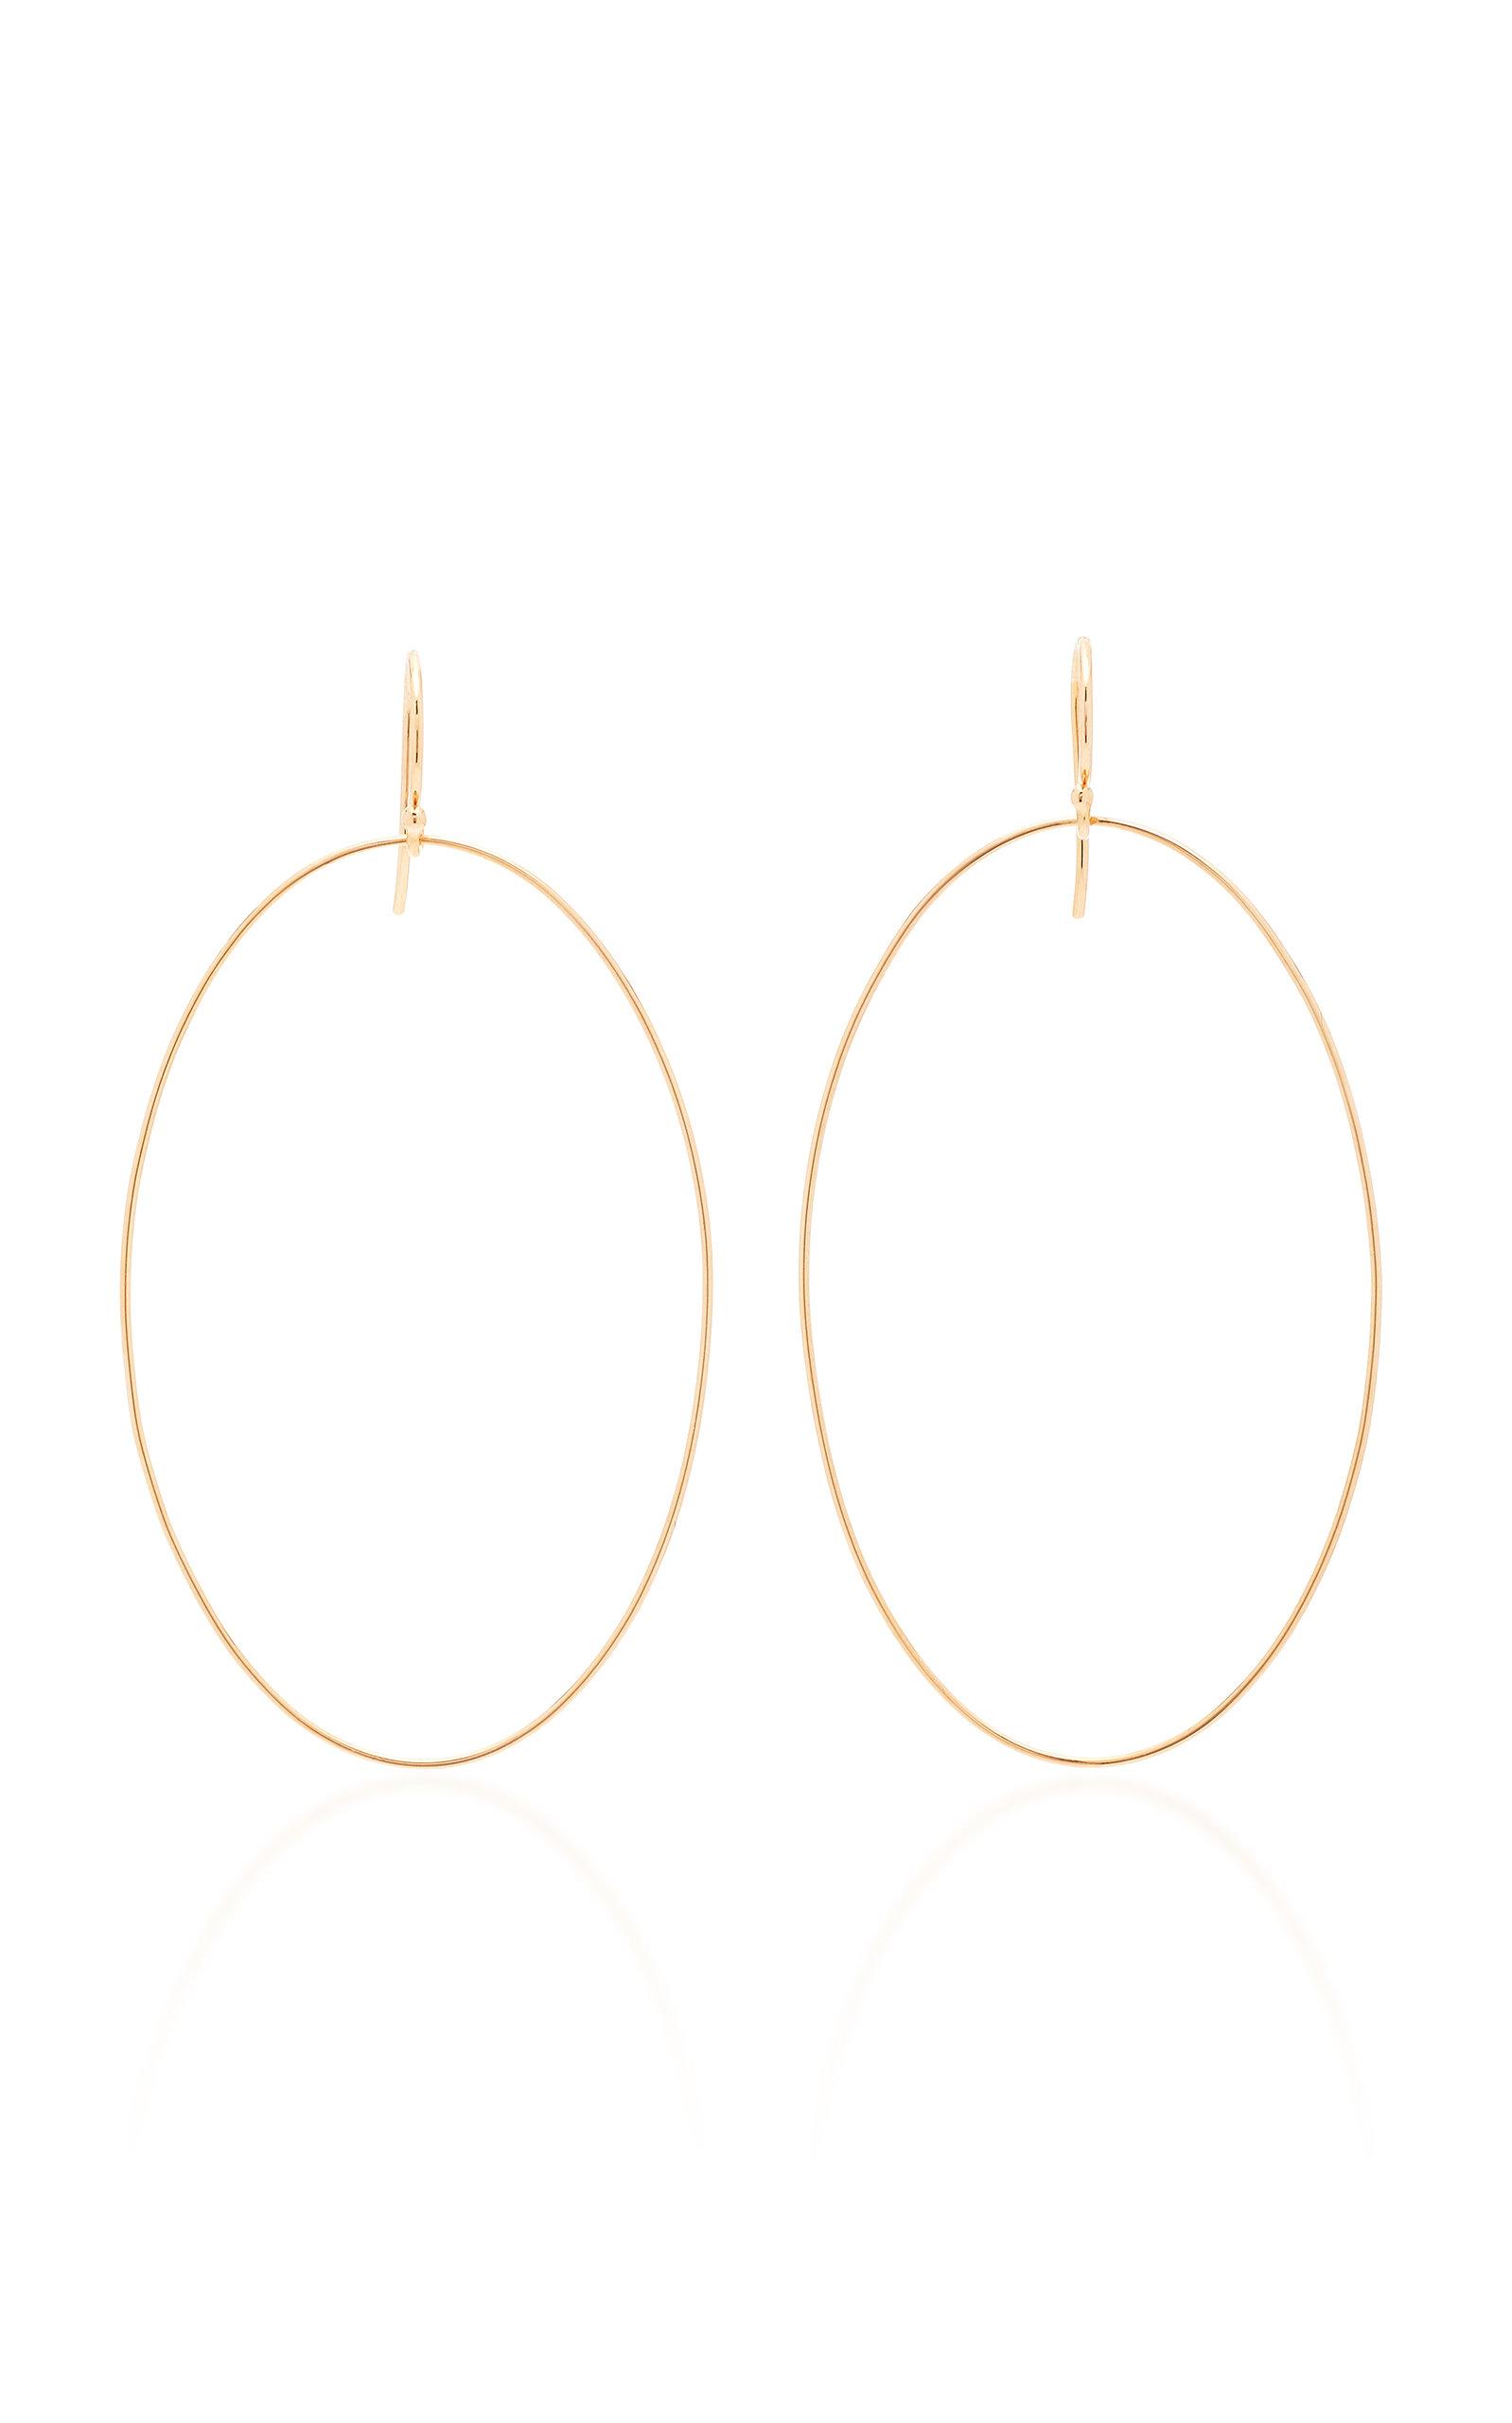 GINETTE NY | Ginette NY Ellipse 18K Rose Gold Earrings | Goxip